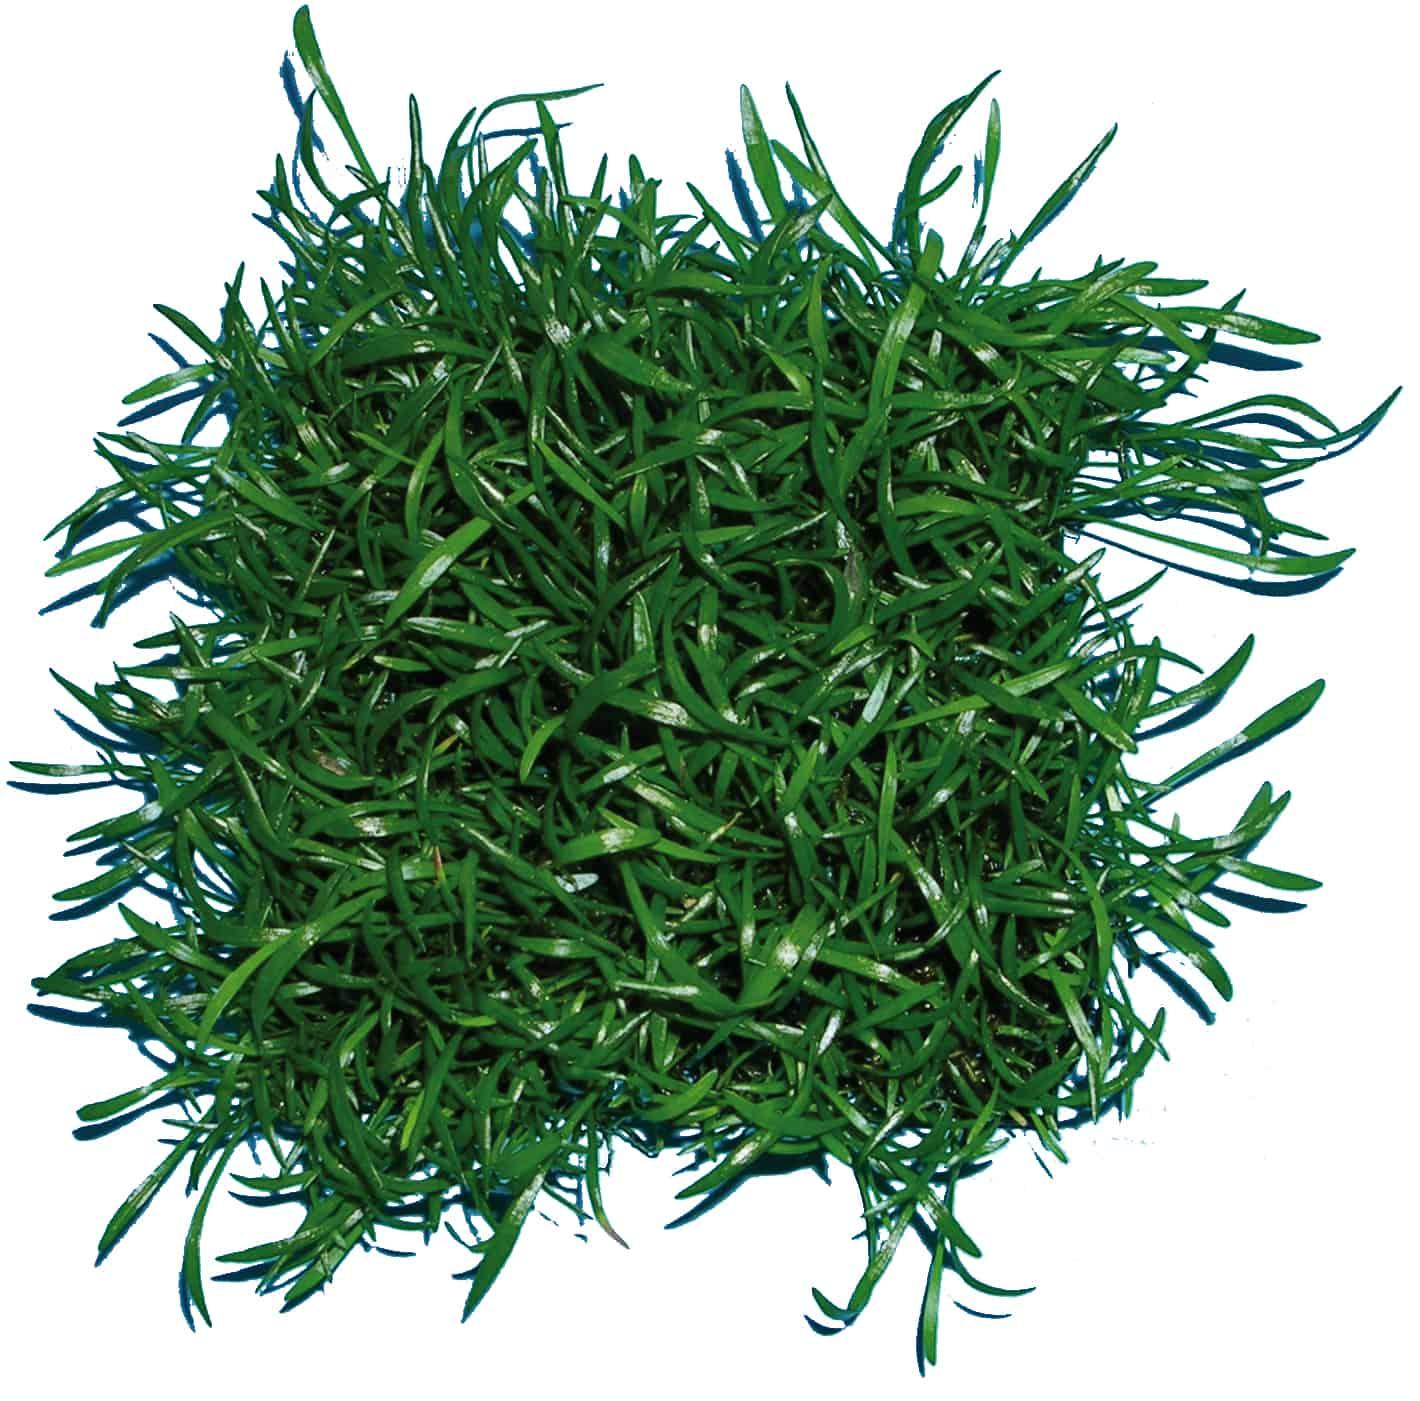 Lilaeopsis brasiliensis - Graspflanze 1